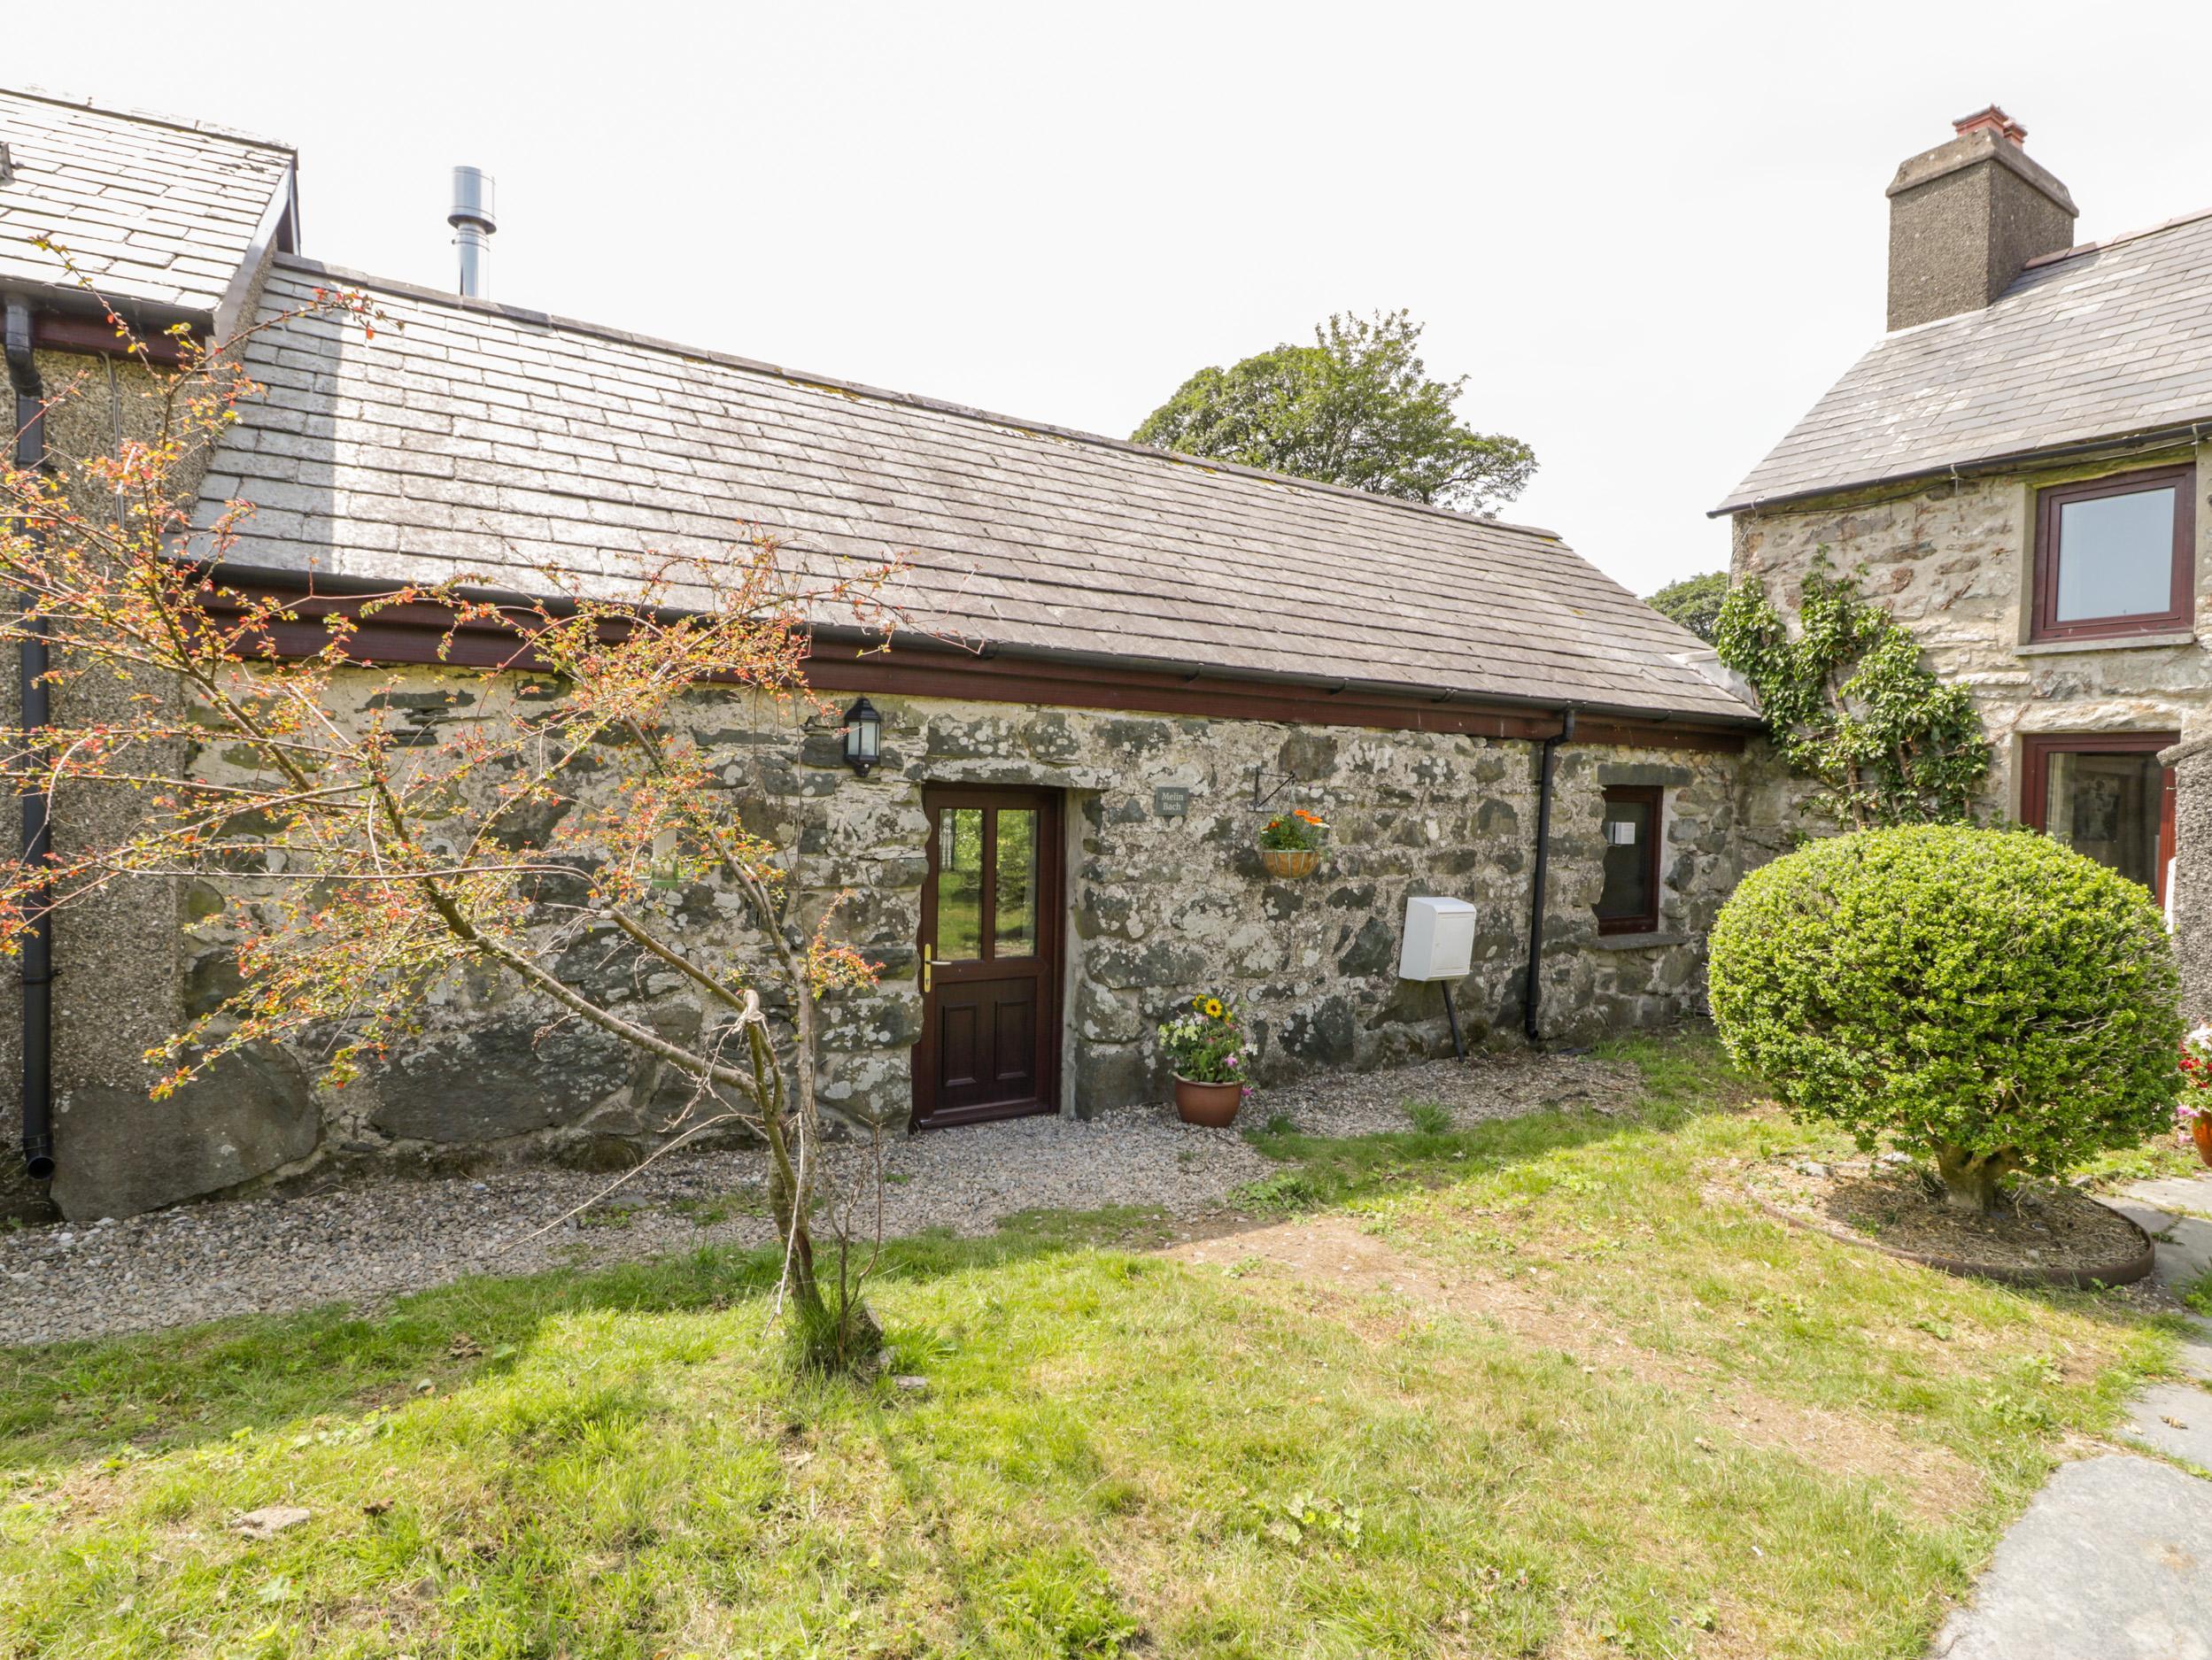 Holiday Cottage Reviews for Melin Bach - Holiday Cottage in Porthmadog, Gwynedd